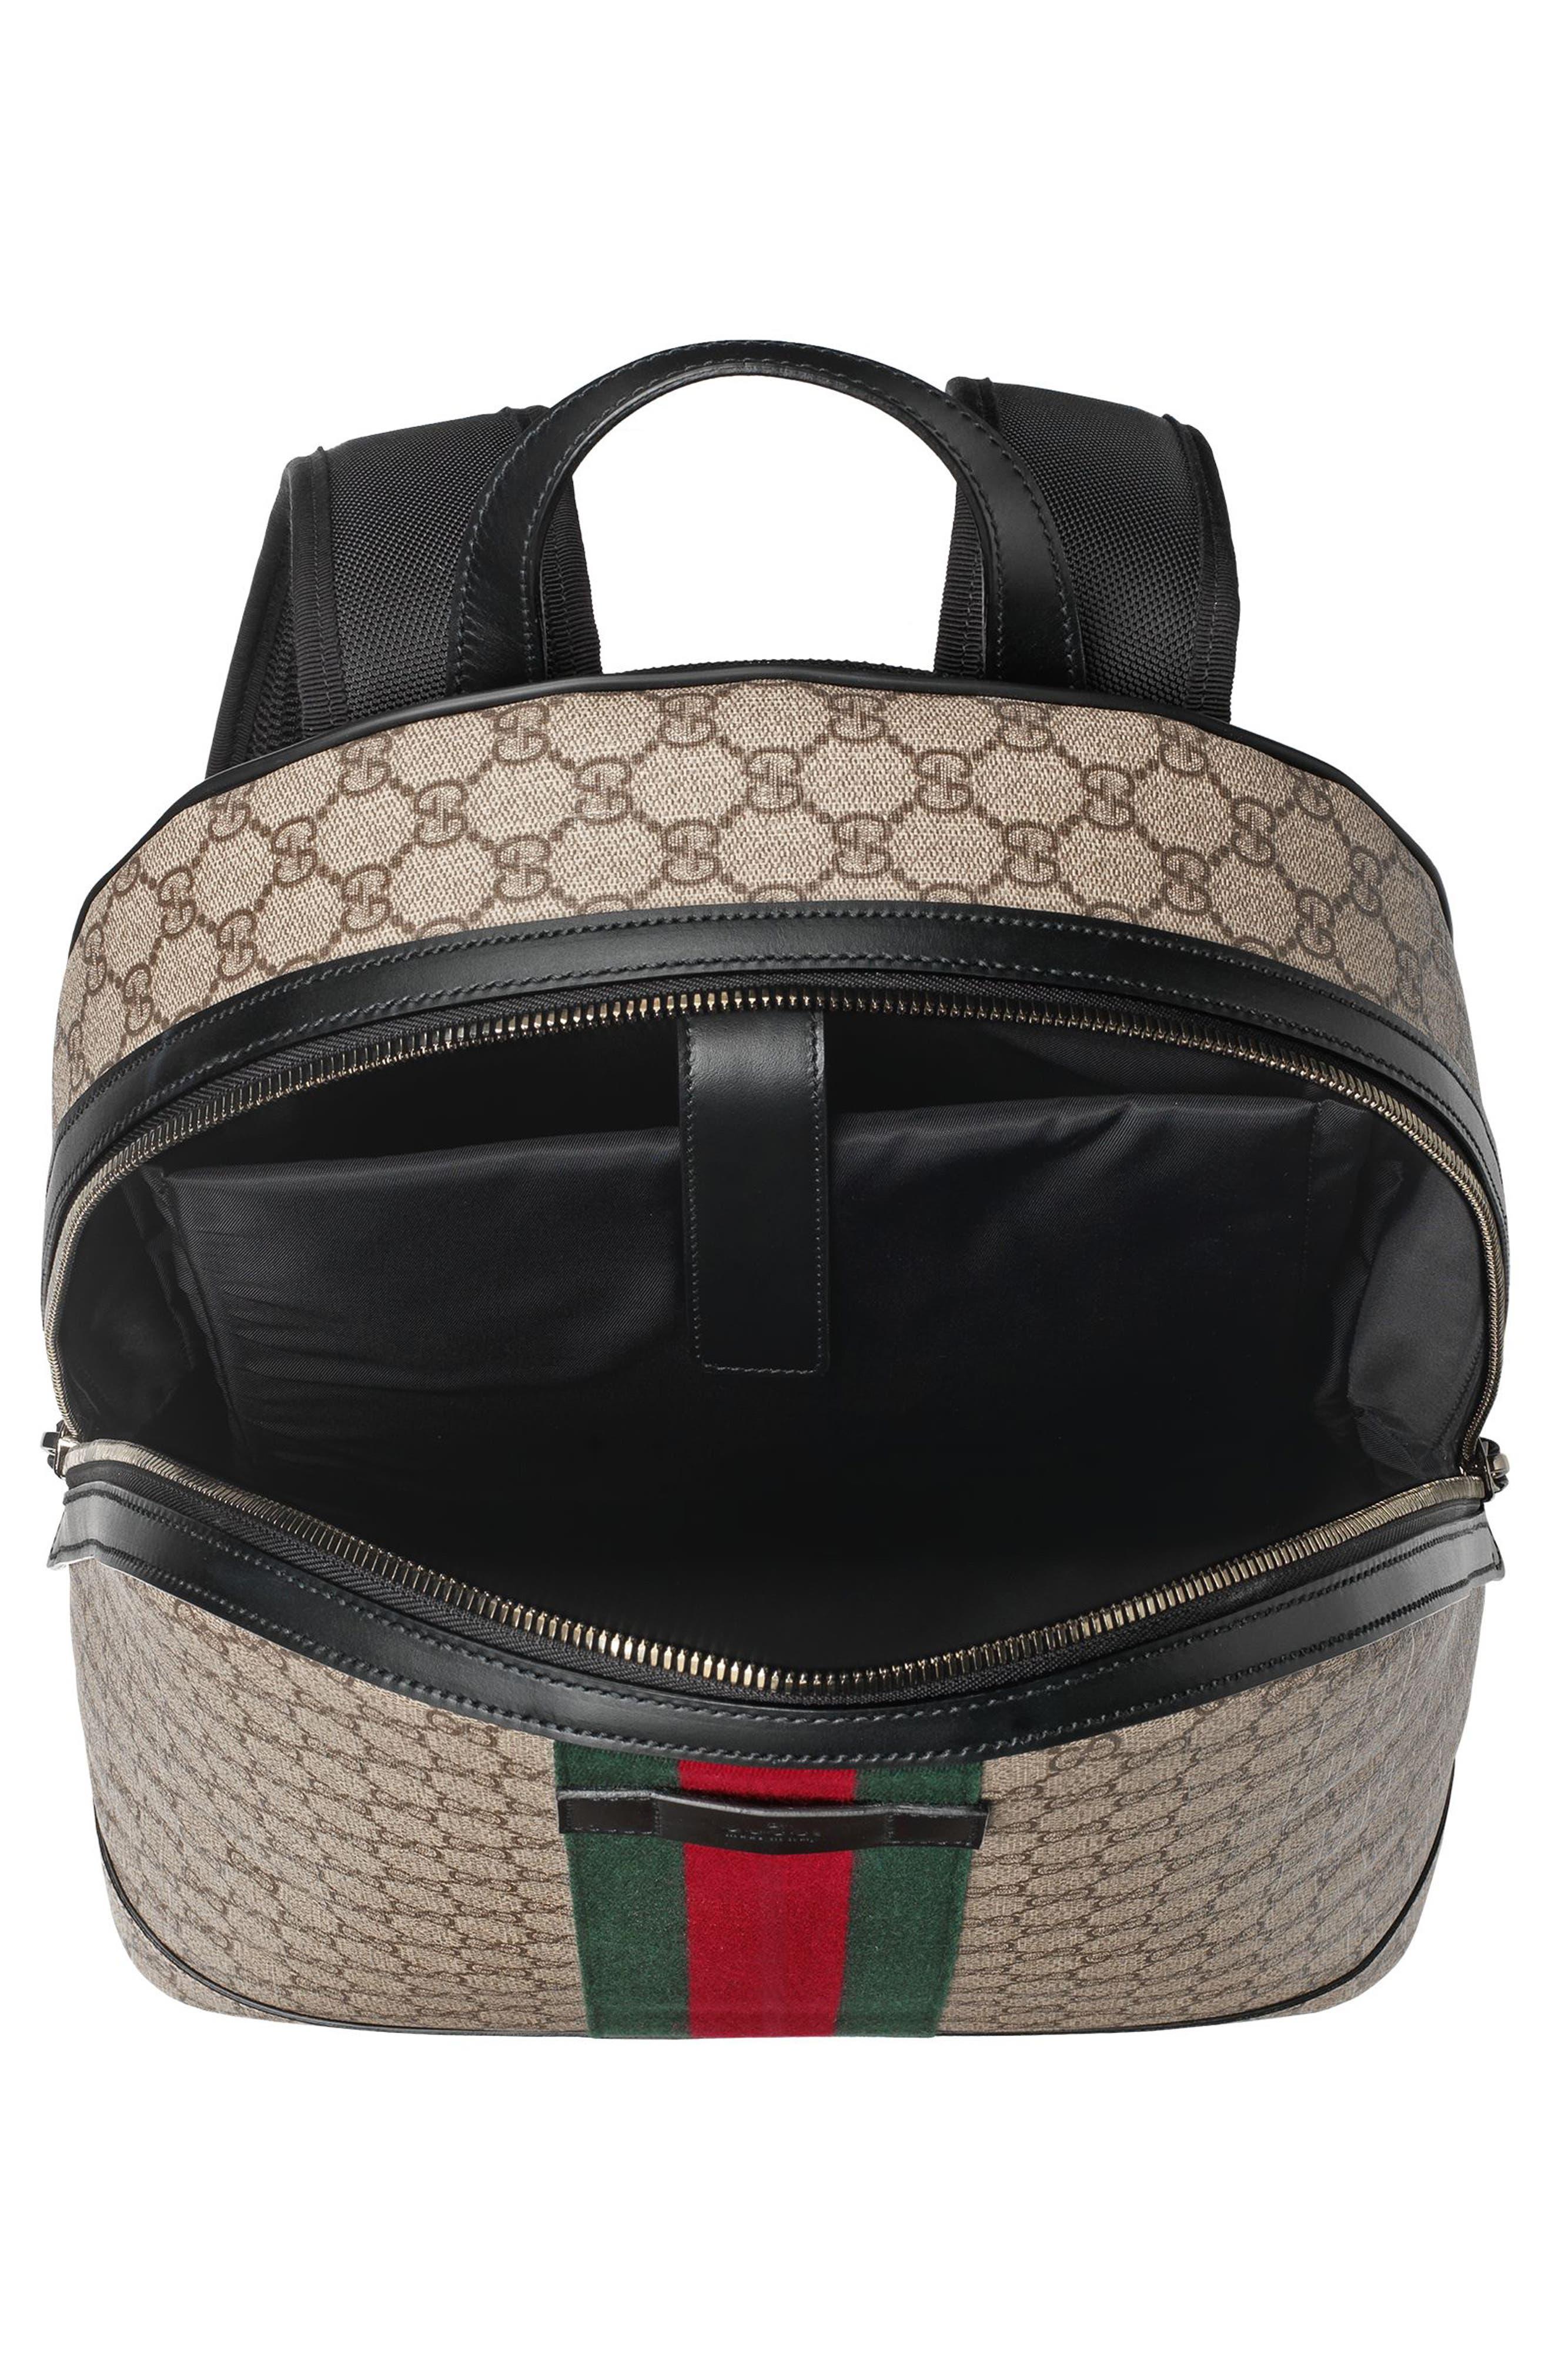 Supreme Stripe Backpack,                             Alternate thumbnail 3, color,                             283